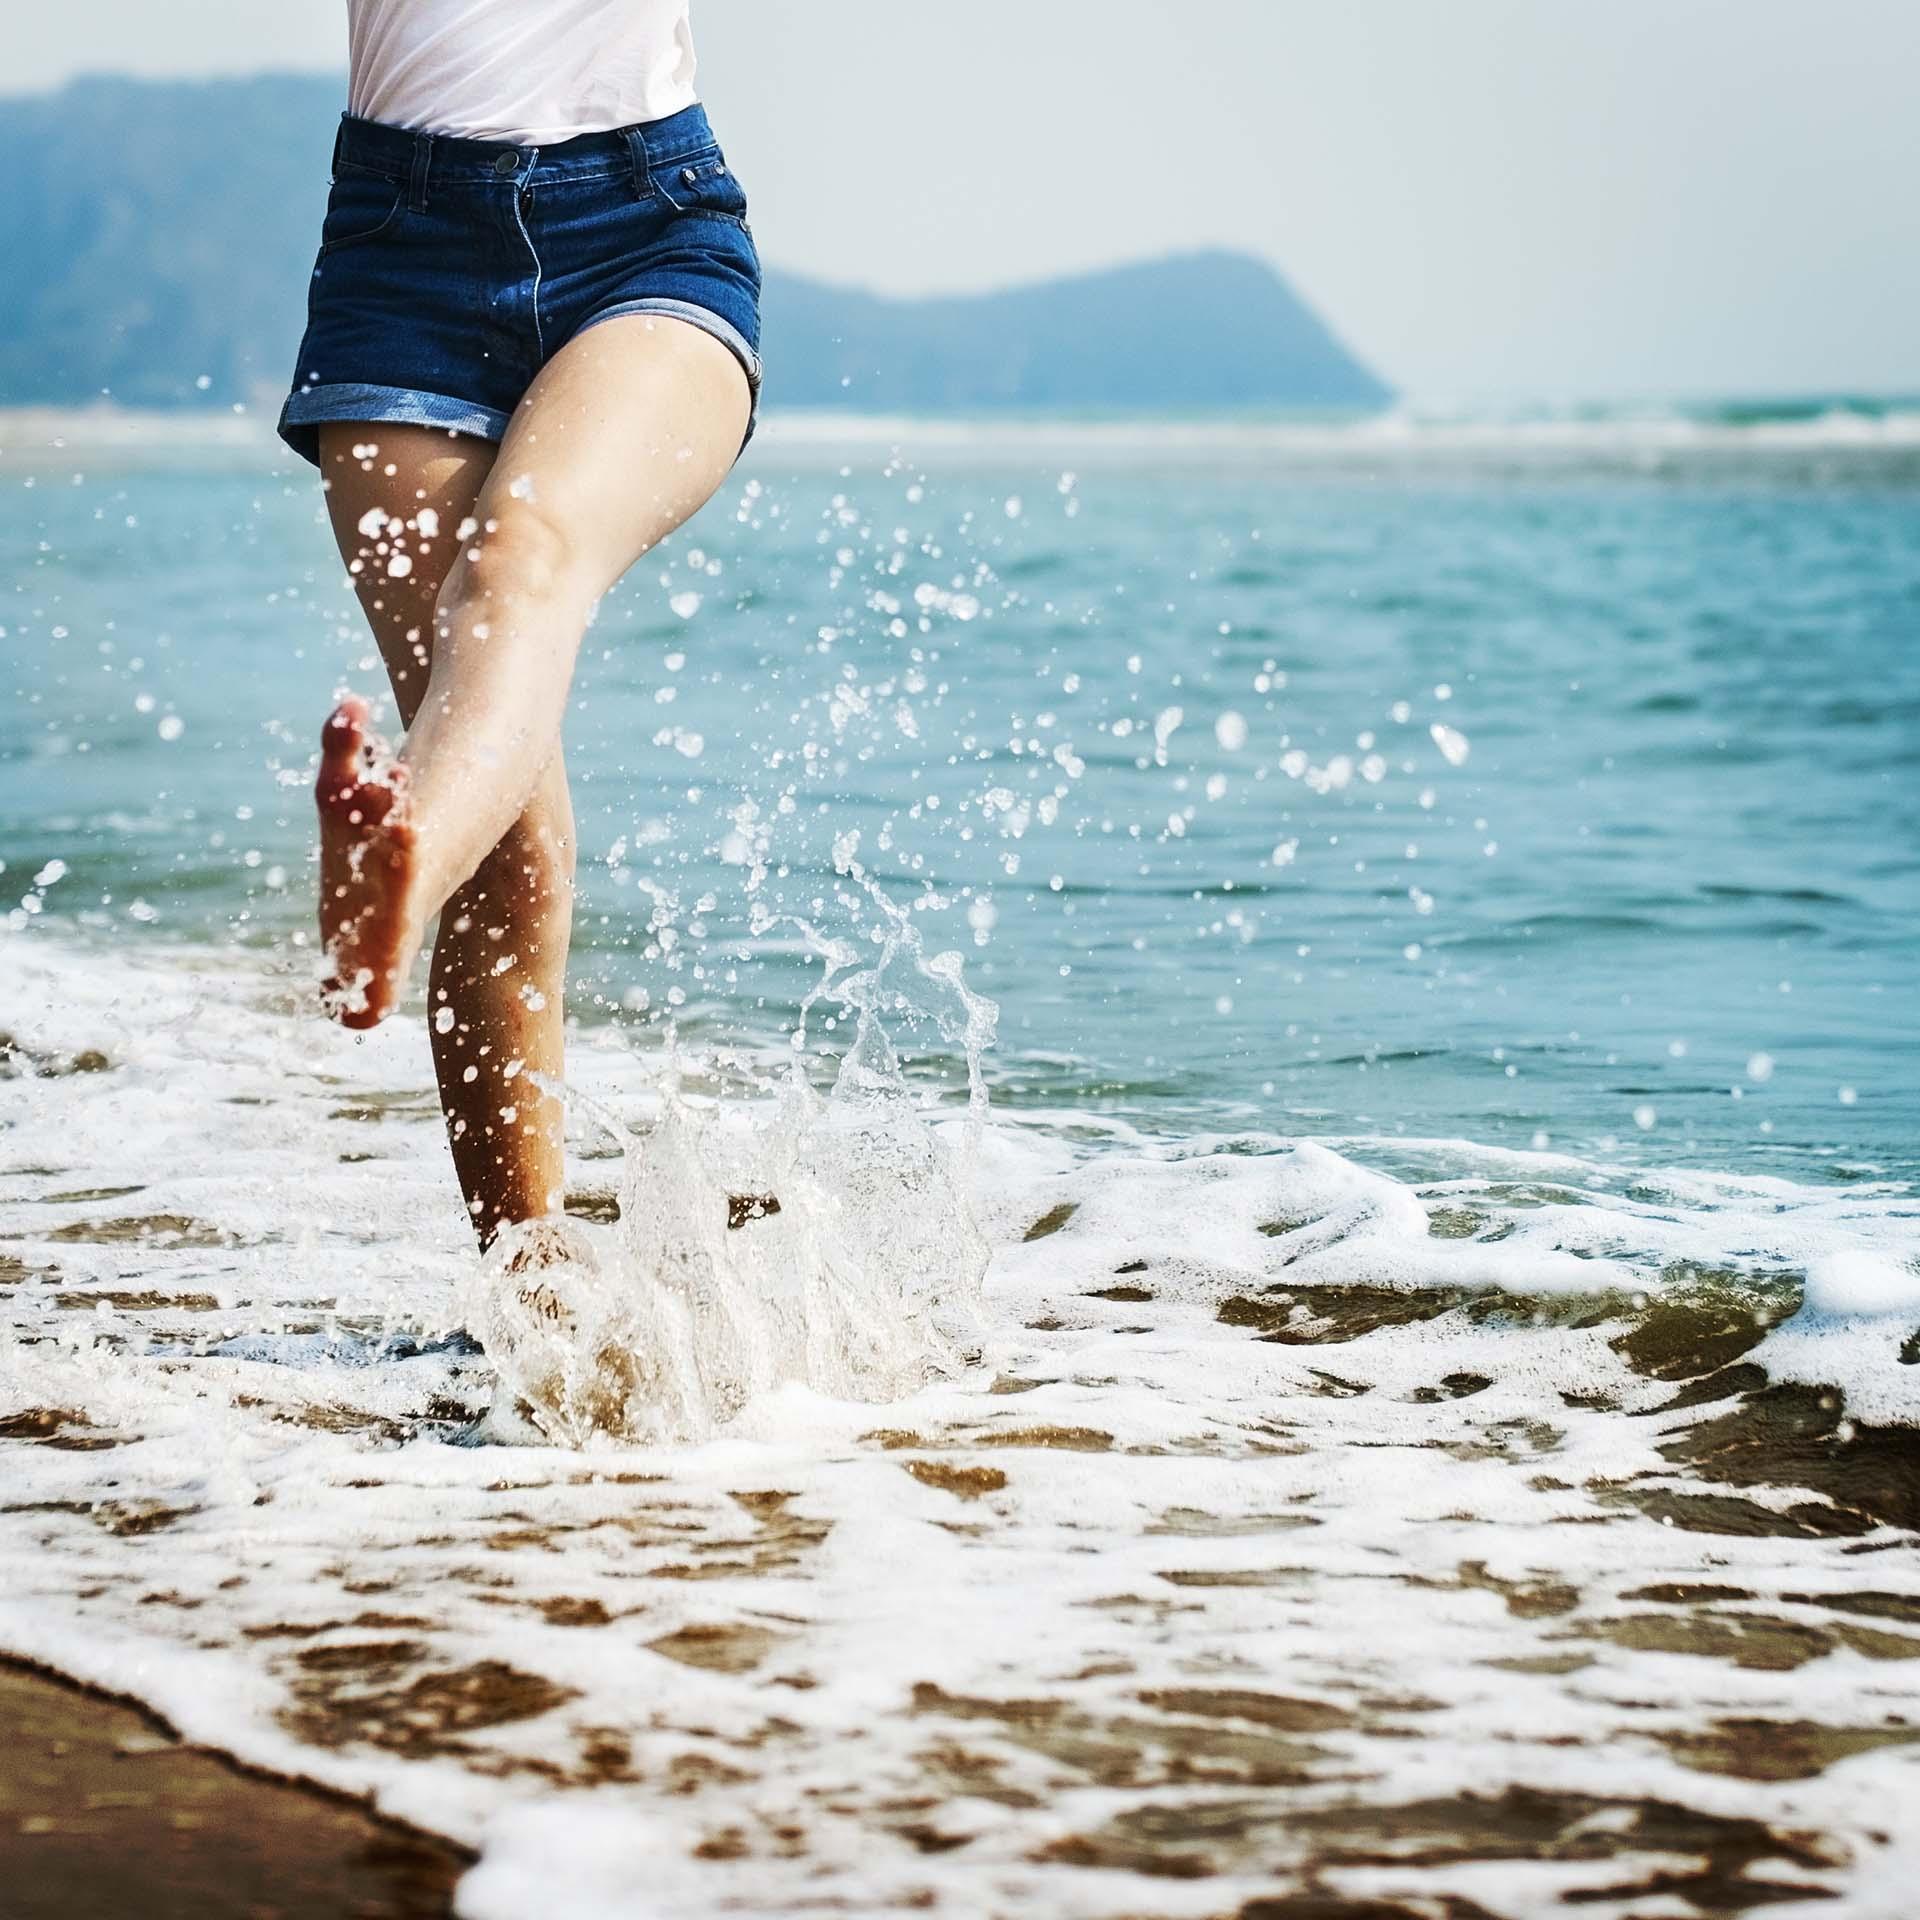 Sea Ocean Sand Beach Vacation Coast Chill Bare Concept